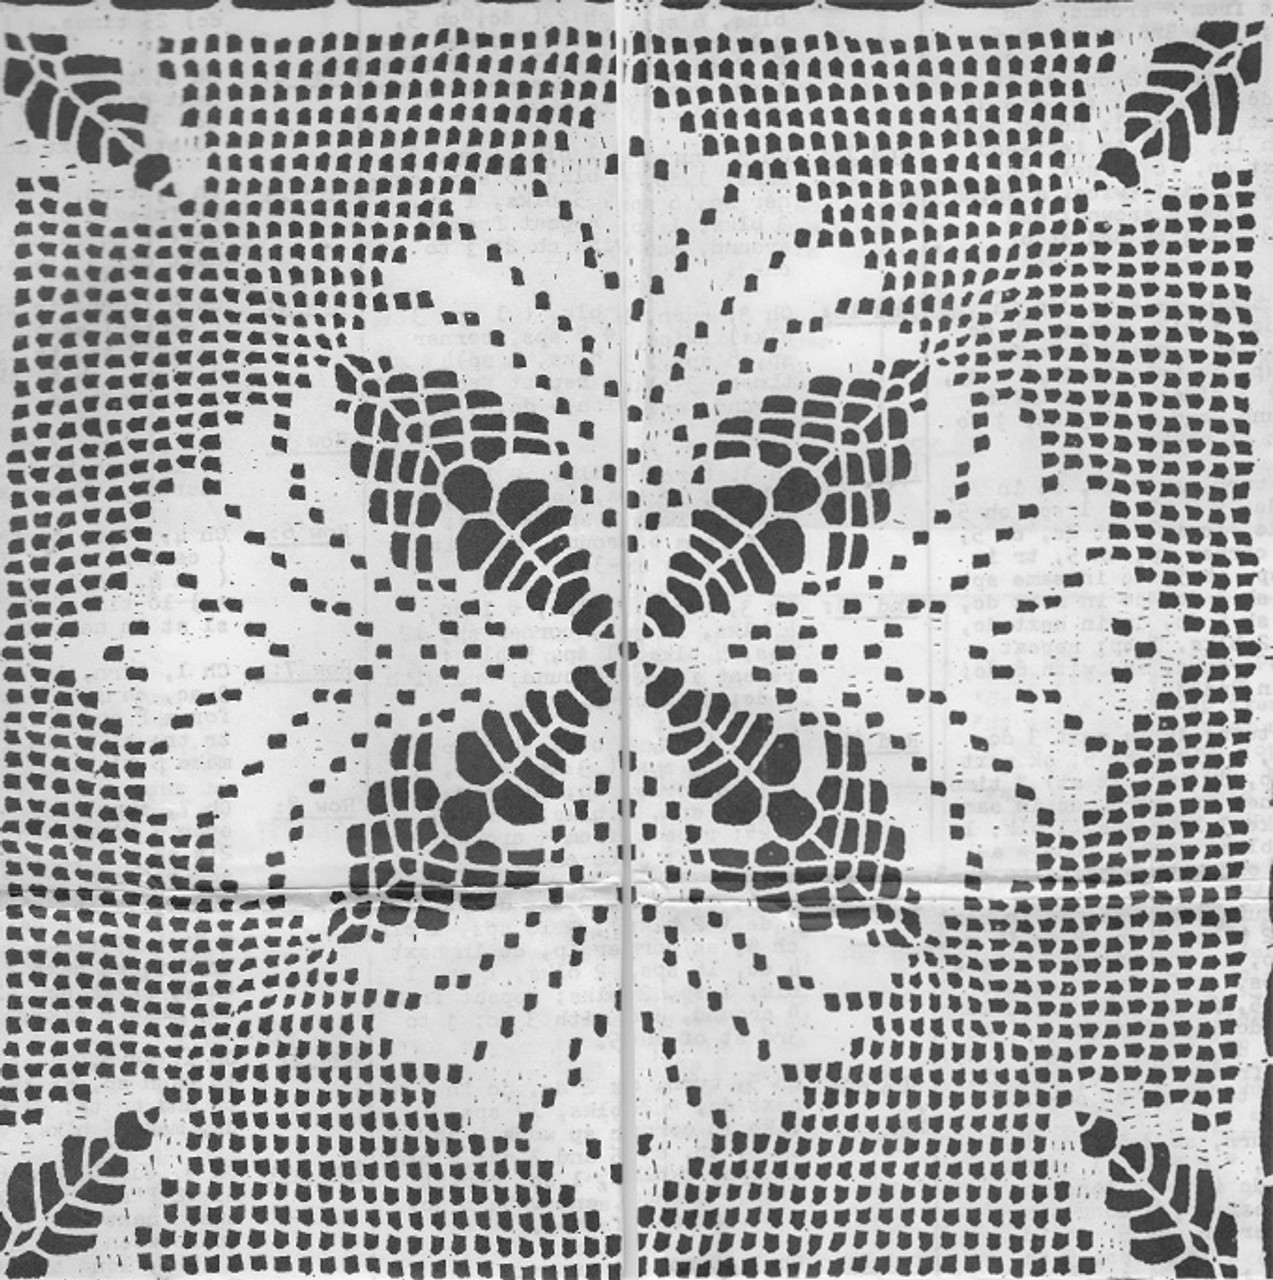 Doily Center Patter Stitch Detail, Martha Madison 270